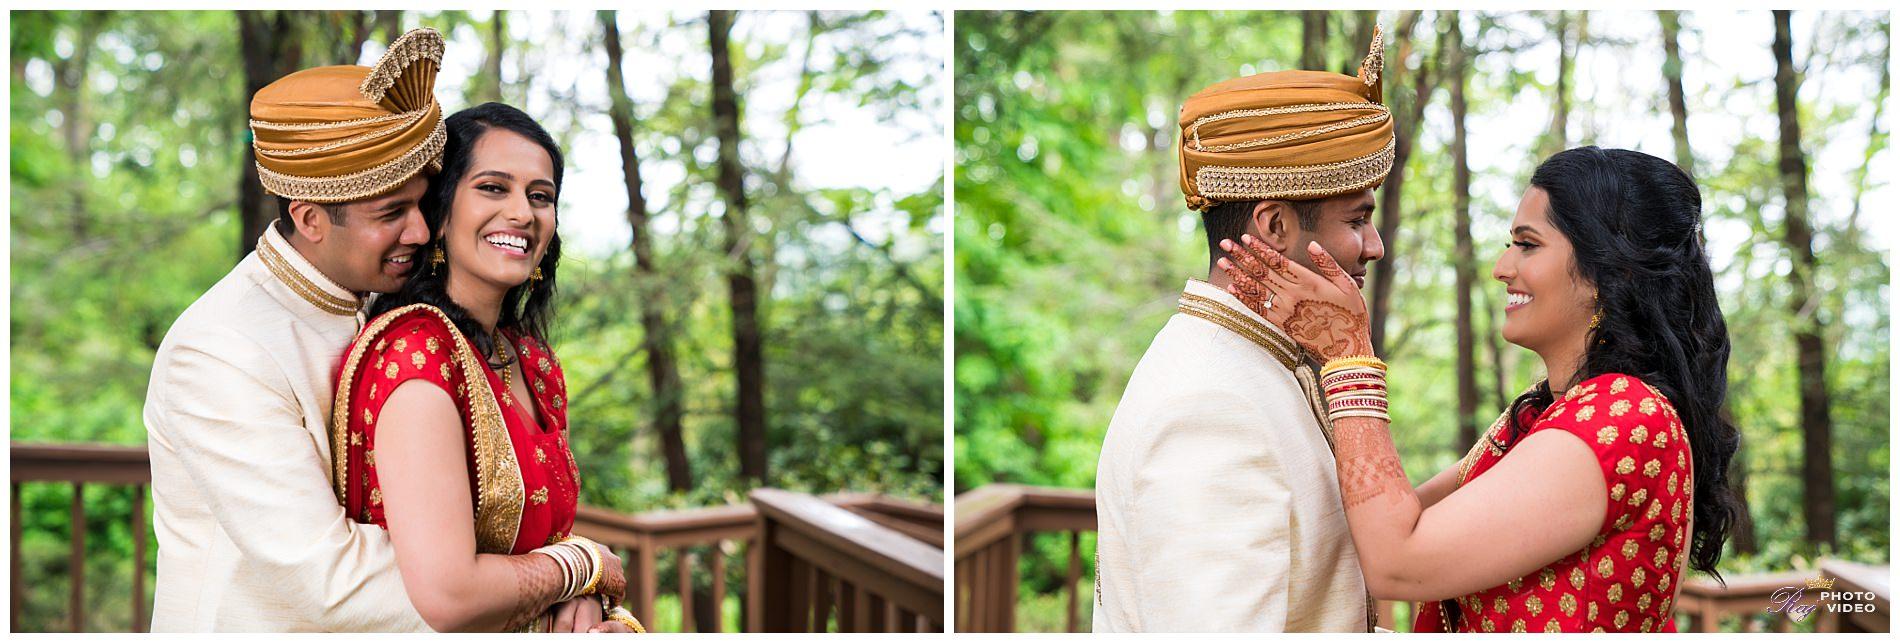 Martinsville-Gardens-NJ-Indian-Wedding-Ruchi-Vishal-10.jpg